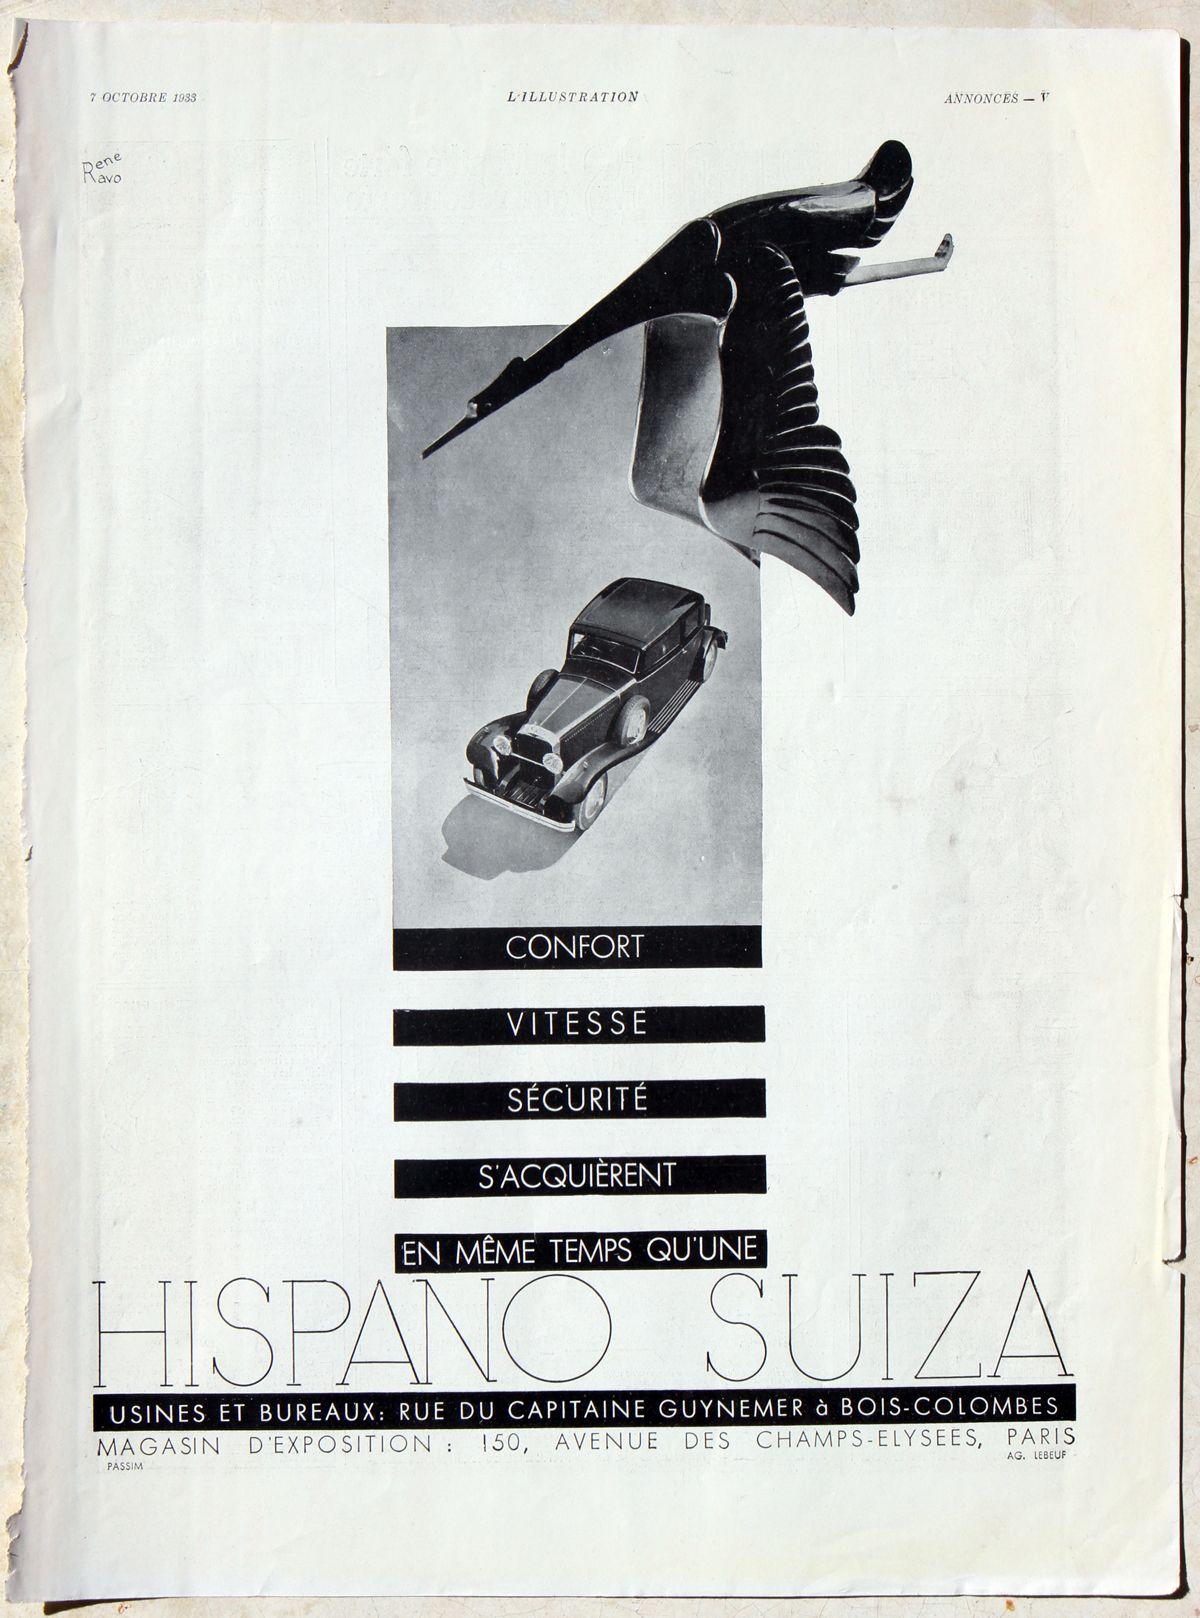 Hispano-Suiza cigueña_Illustration_Octubre 1933_Francia